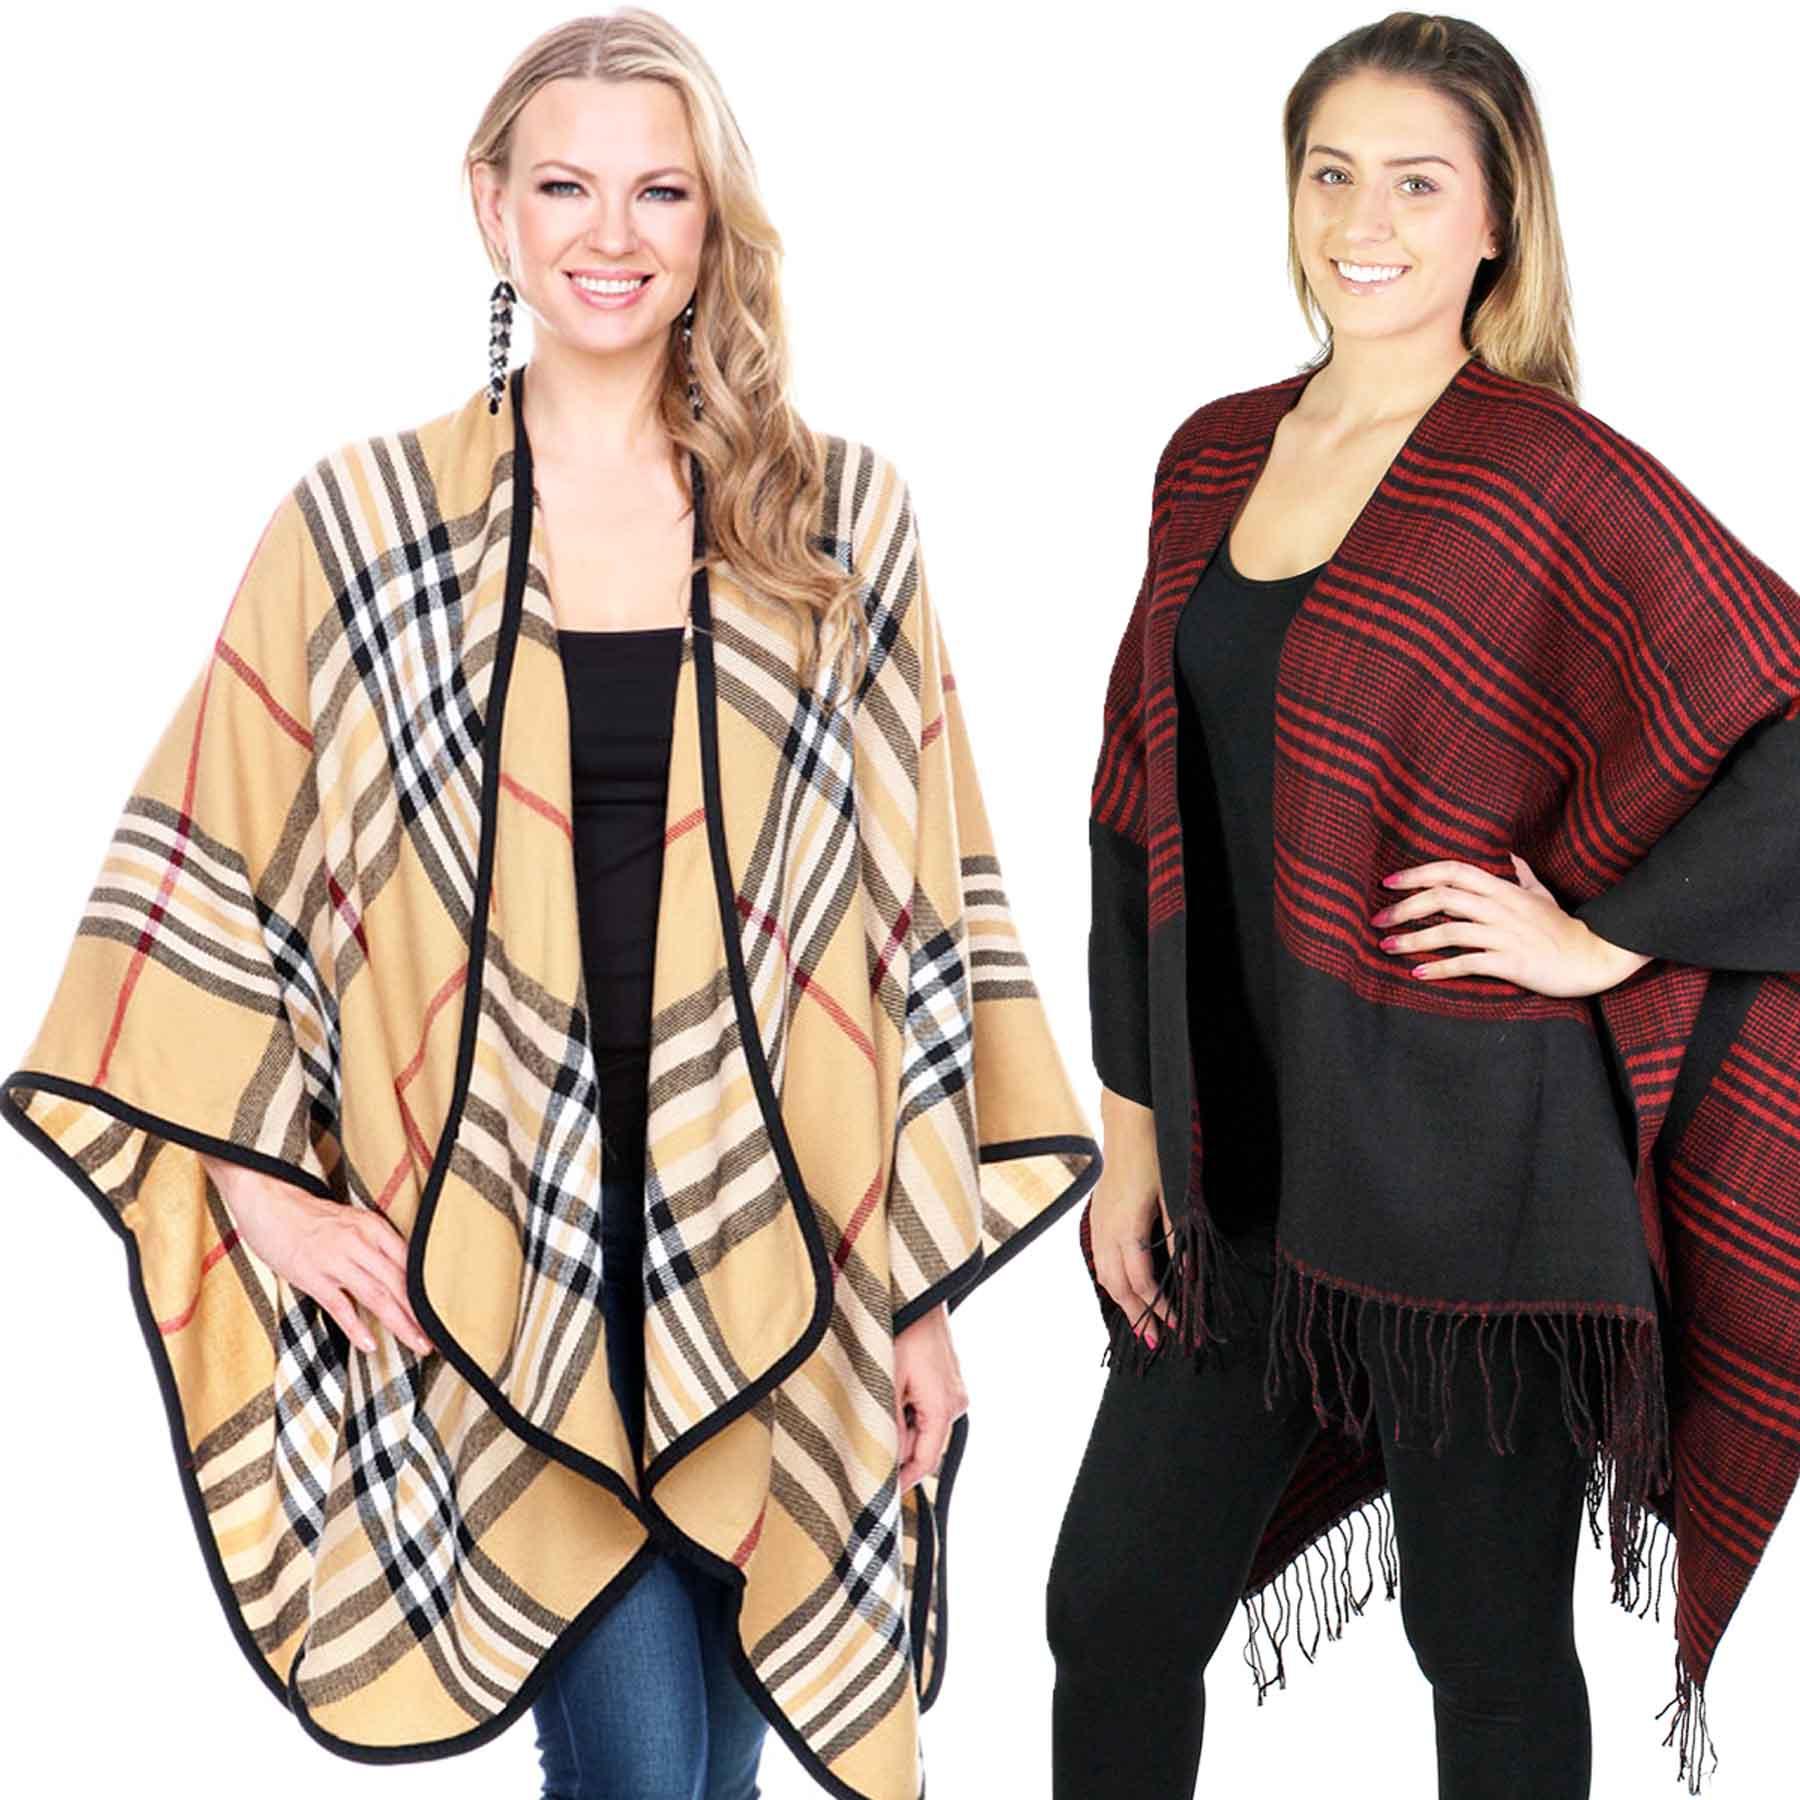 Winter Ruana - Plaids, Houndstooth, & Tweeds